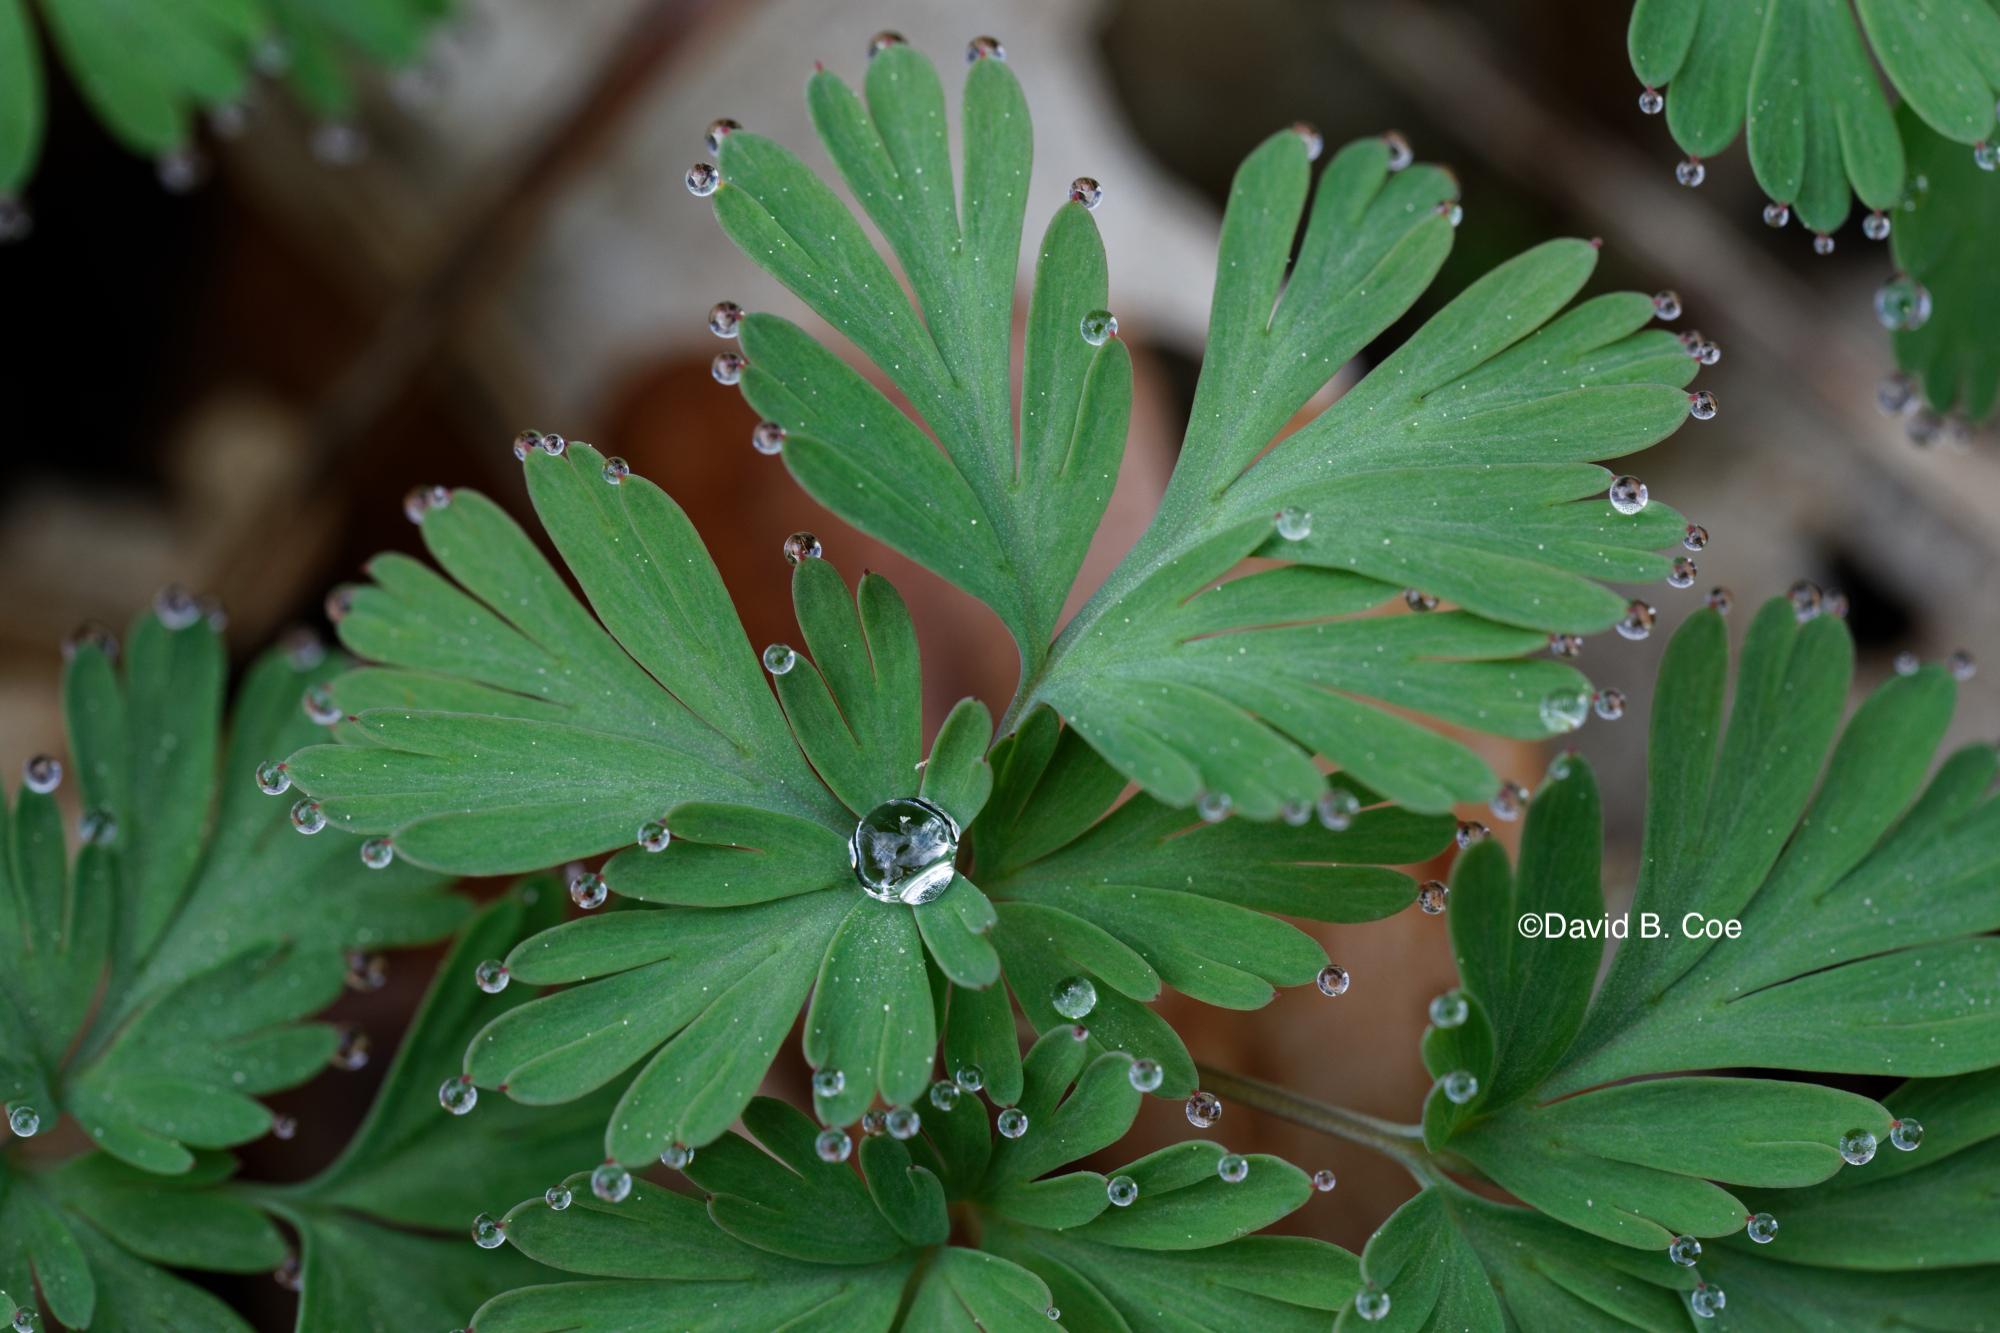 Dutchman's Breeches Greens and Raindrops, by David B. Coe